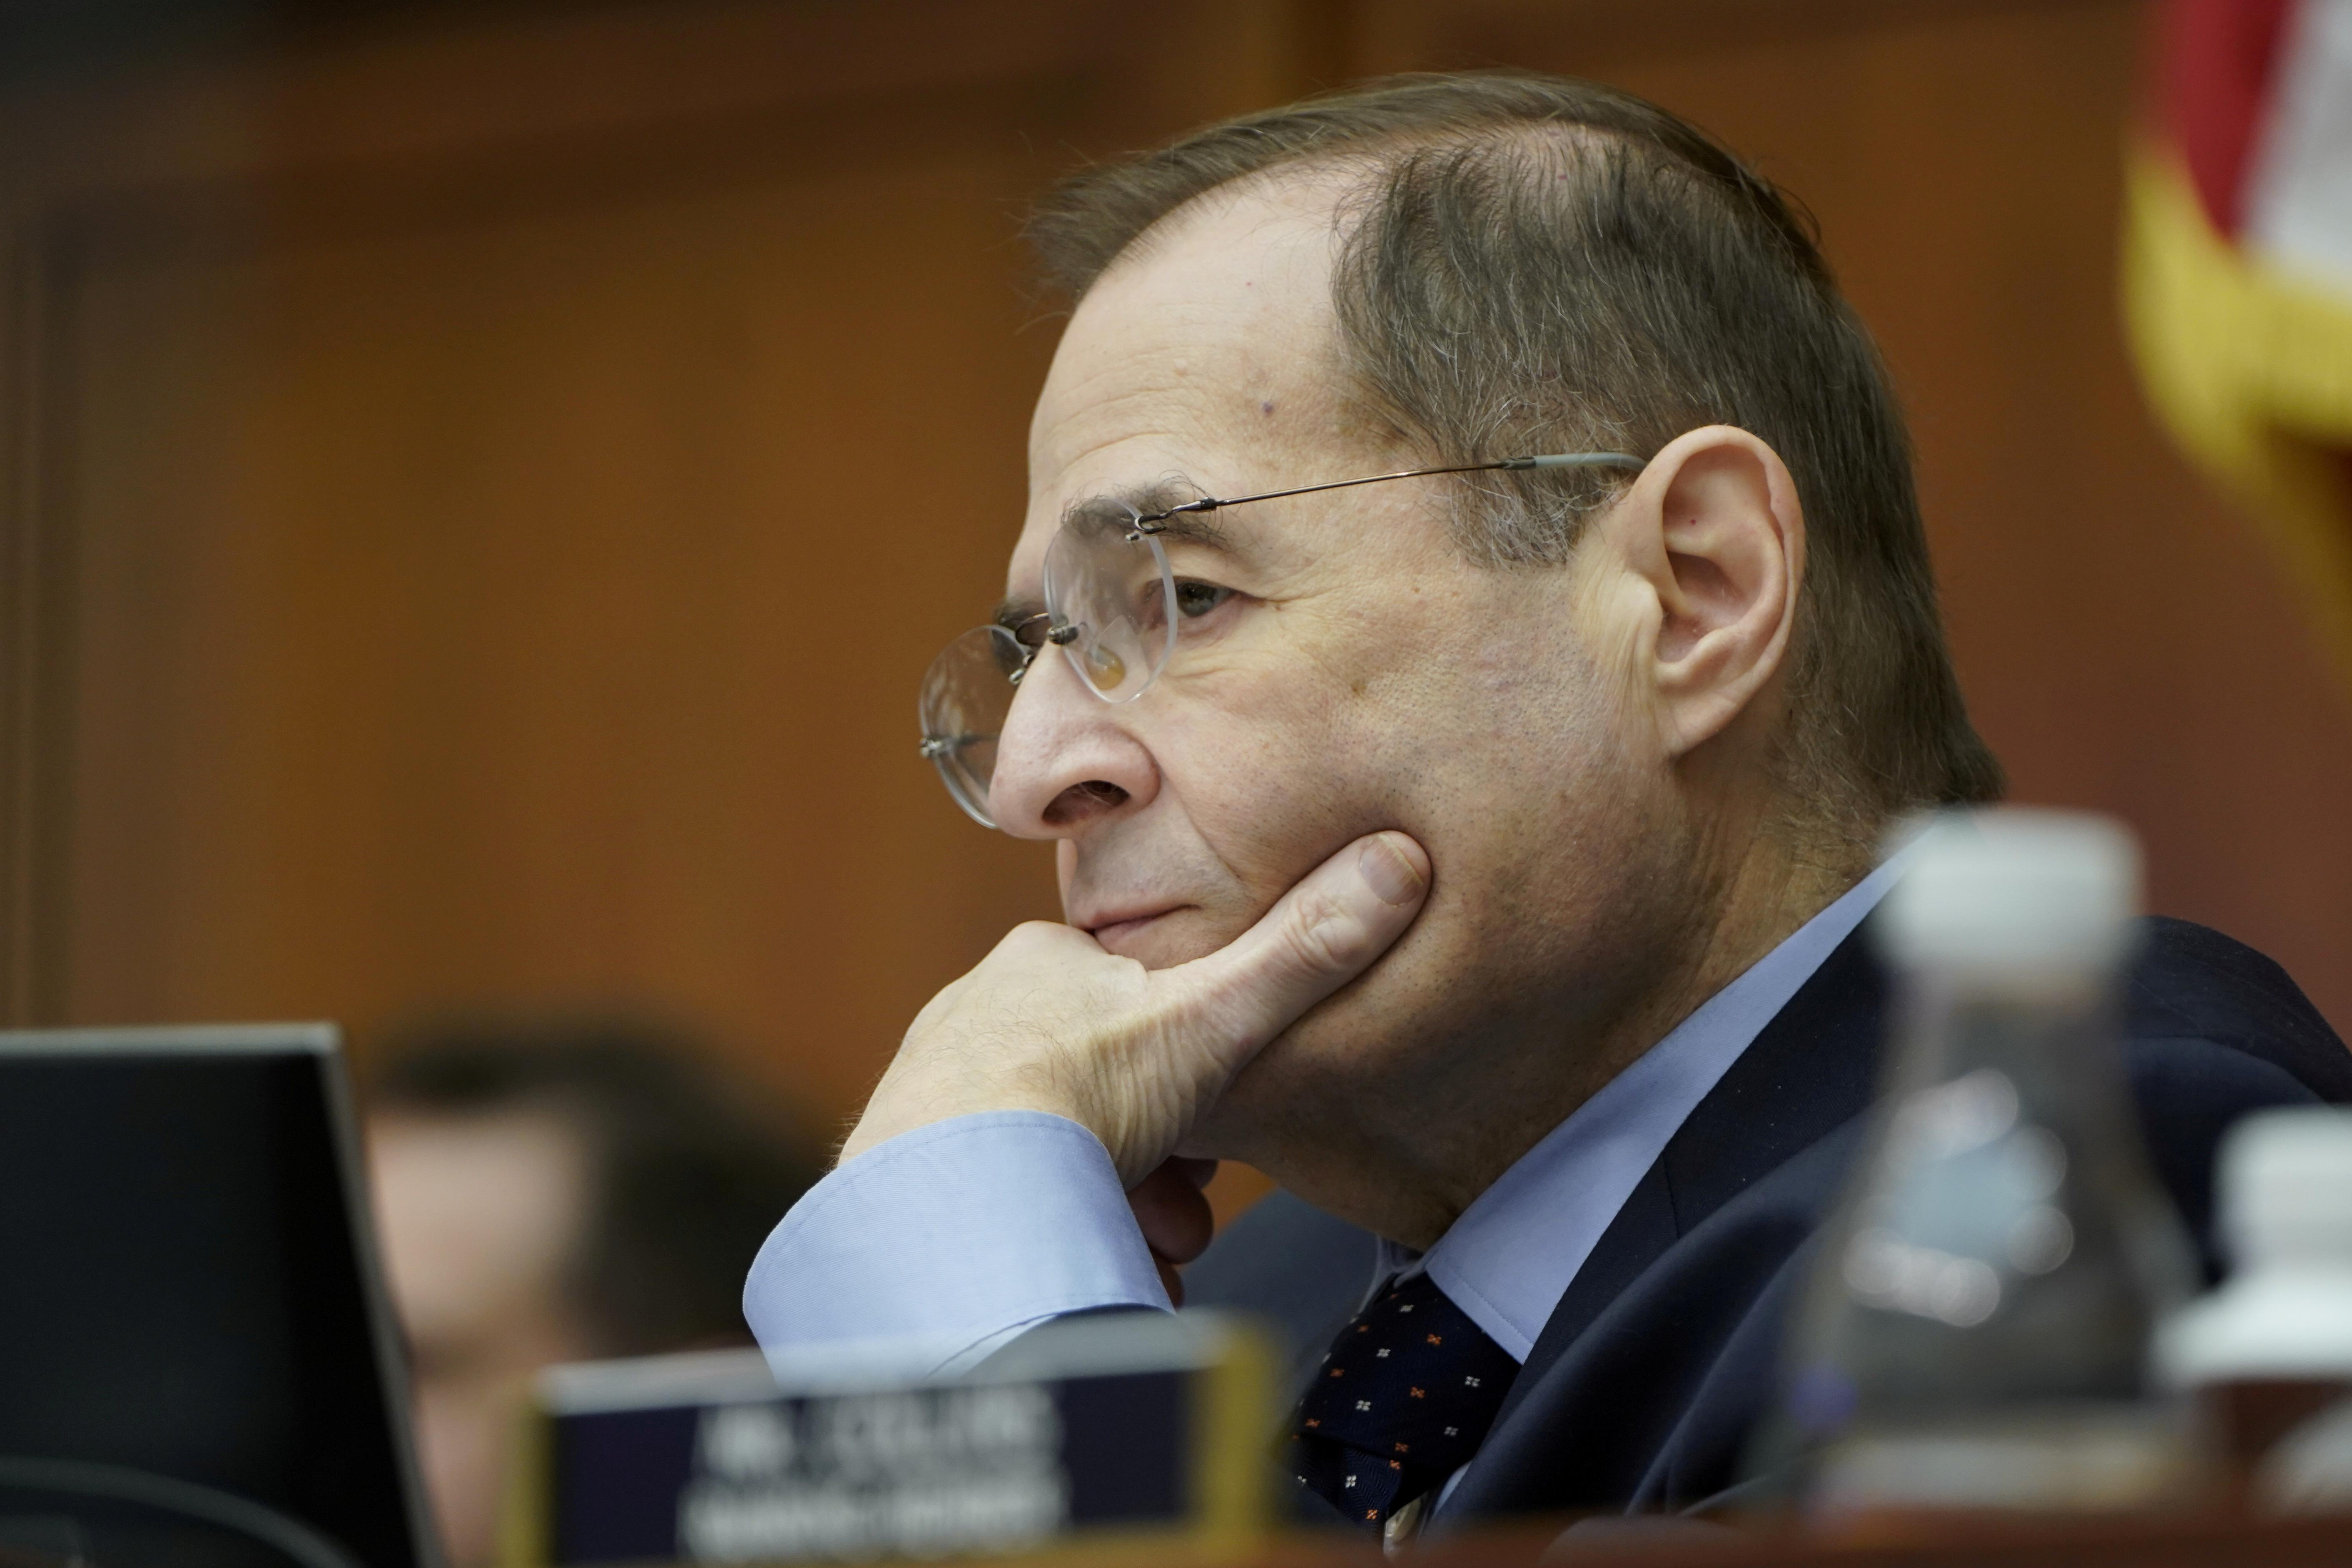 U.S. House Judiciary Committee poised to subpoena full Mueller report